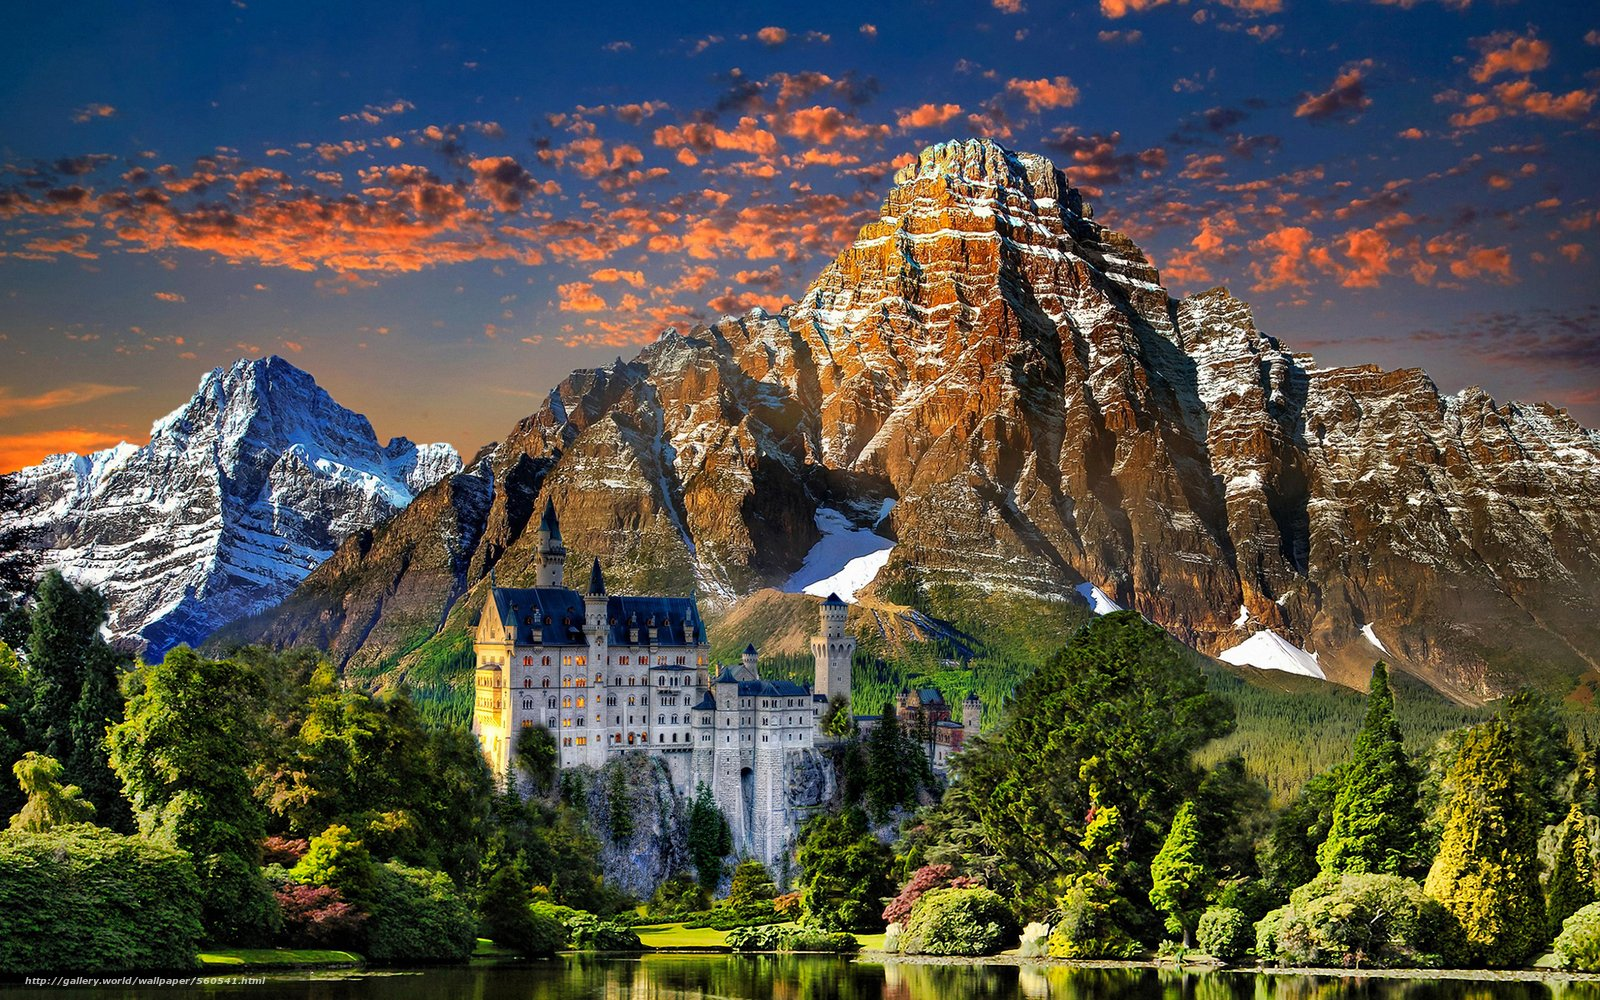 wallpaper Castle Neyshvanshteyn Munich Germany landscape 1600x1000